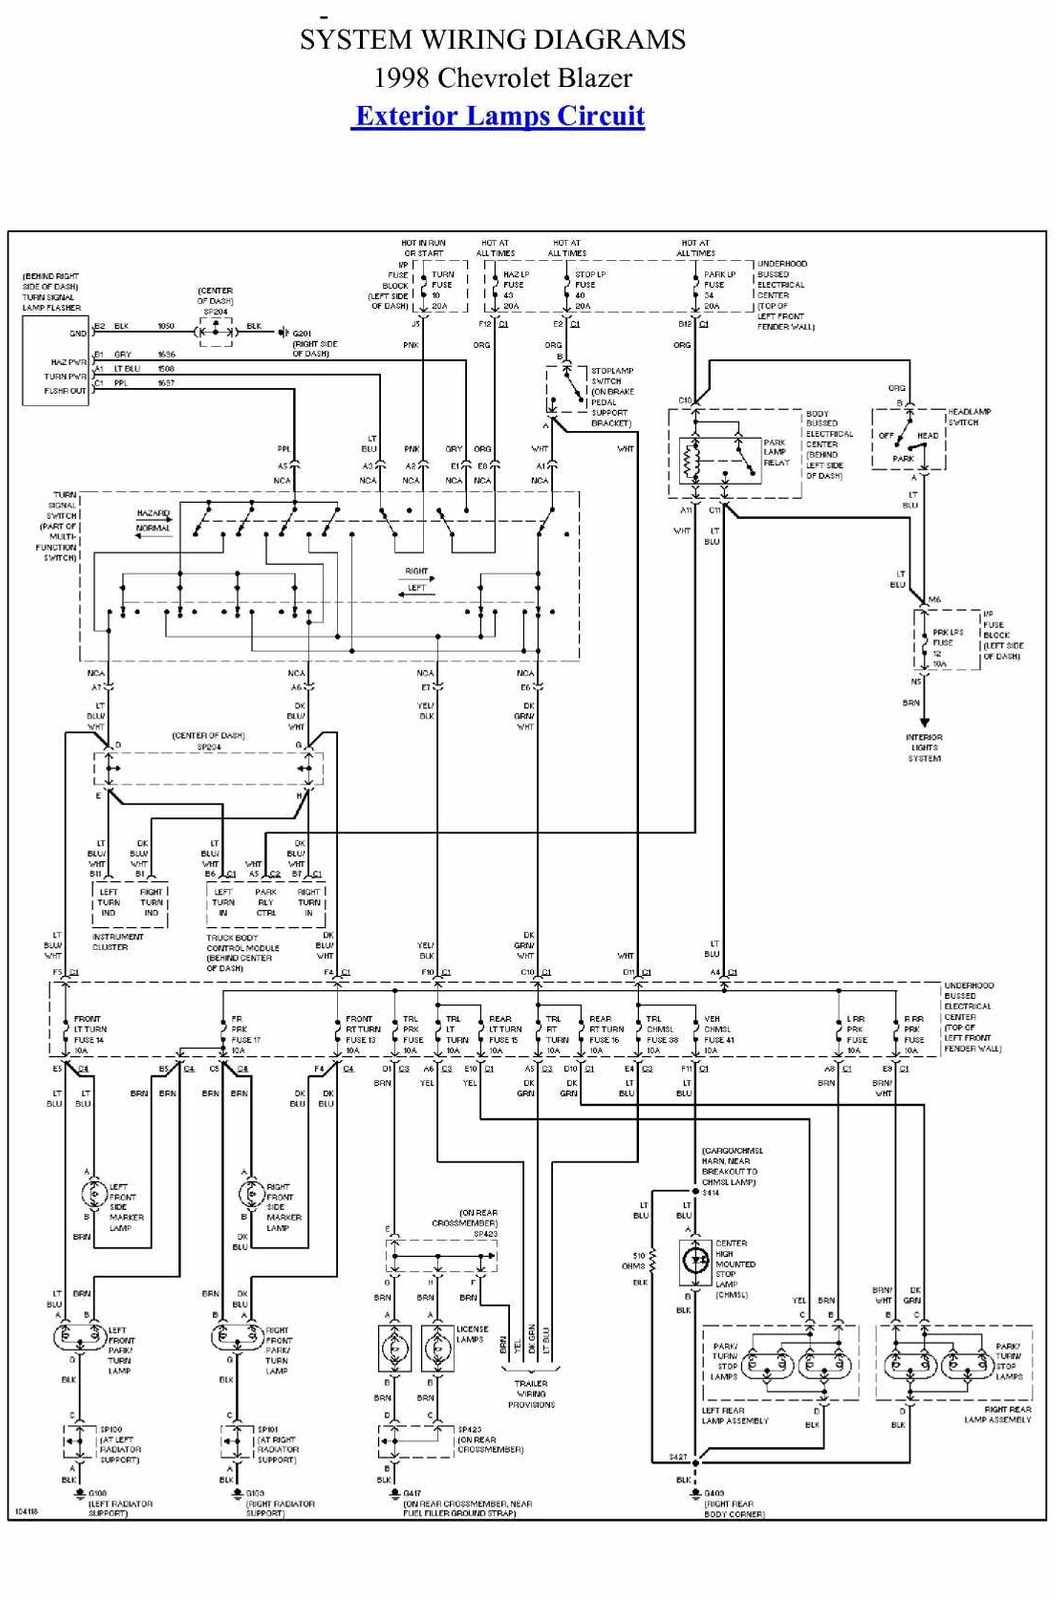 hight resolution of 1998 chevy blazer wiring diagram 9 27 kenmo lp de u2022